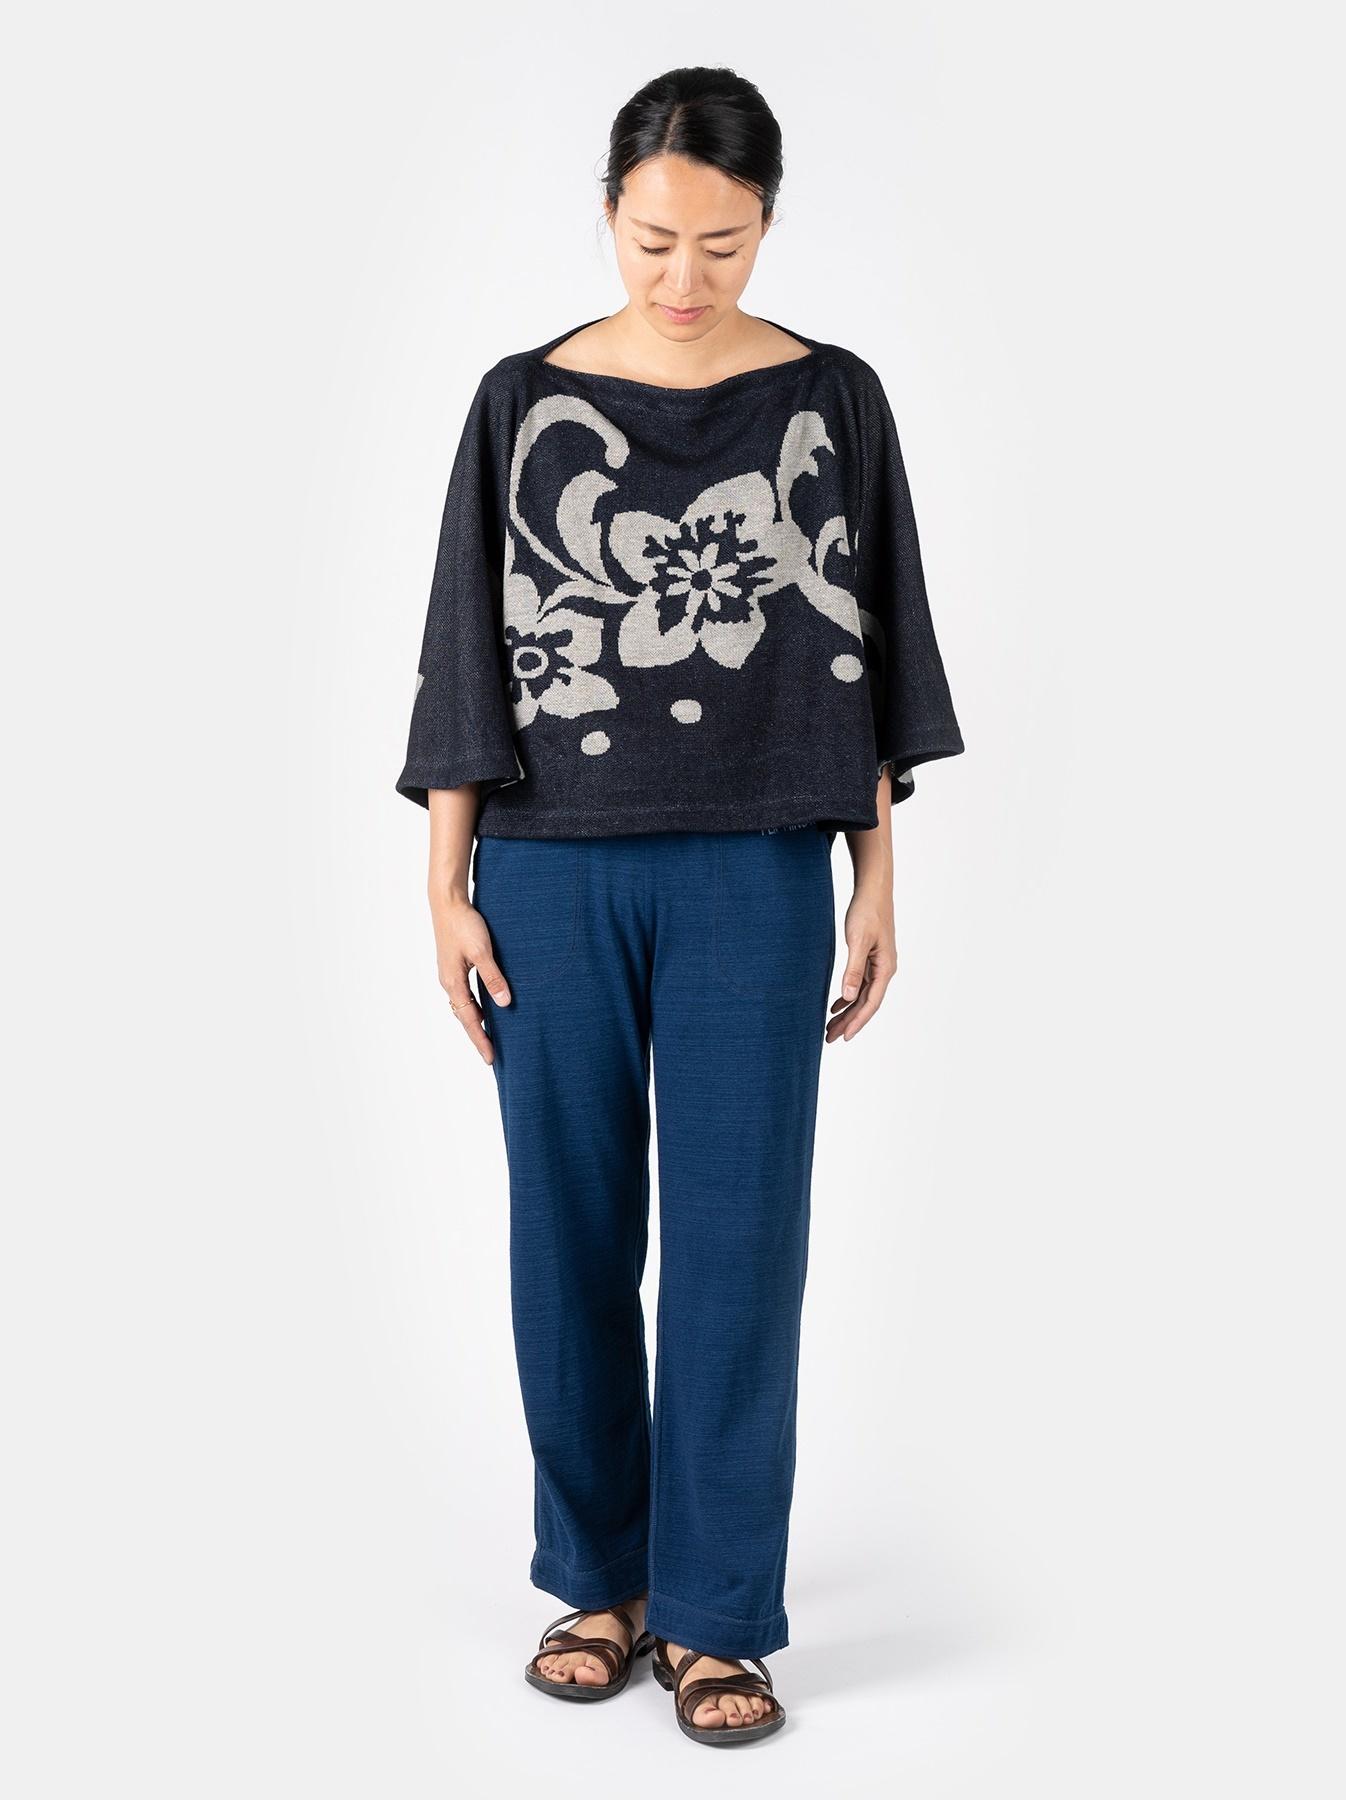 WH Indigo Linen Jacquard Yakko T-shirt-2